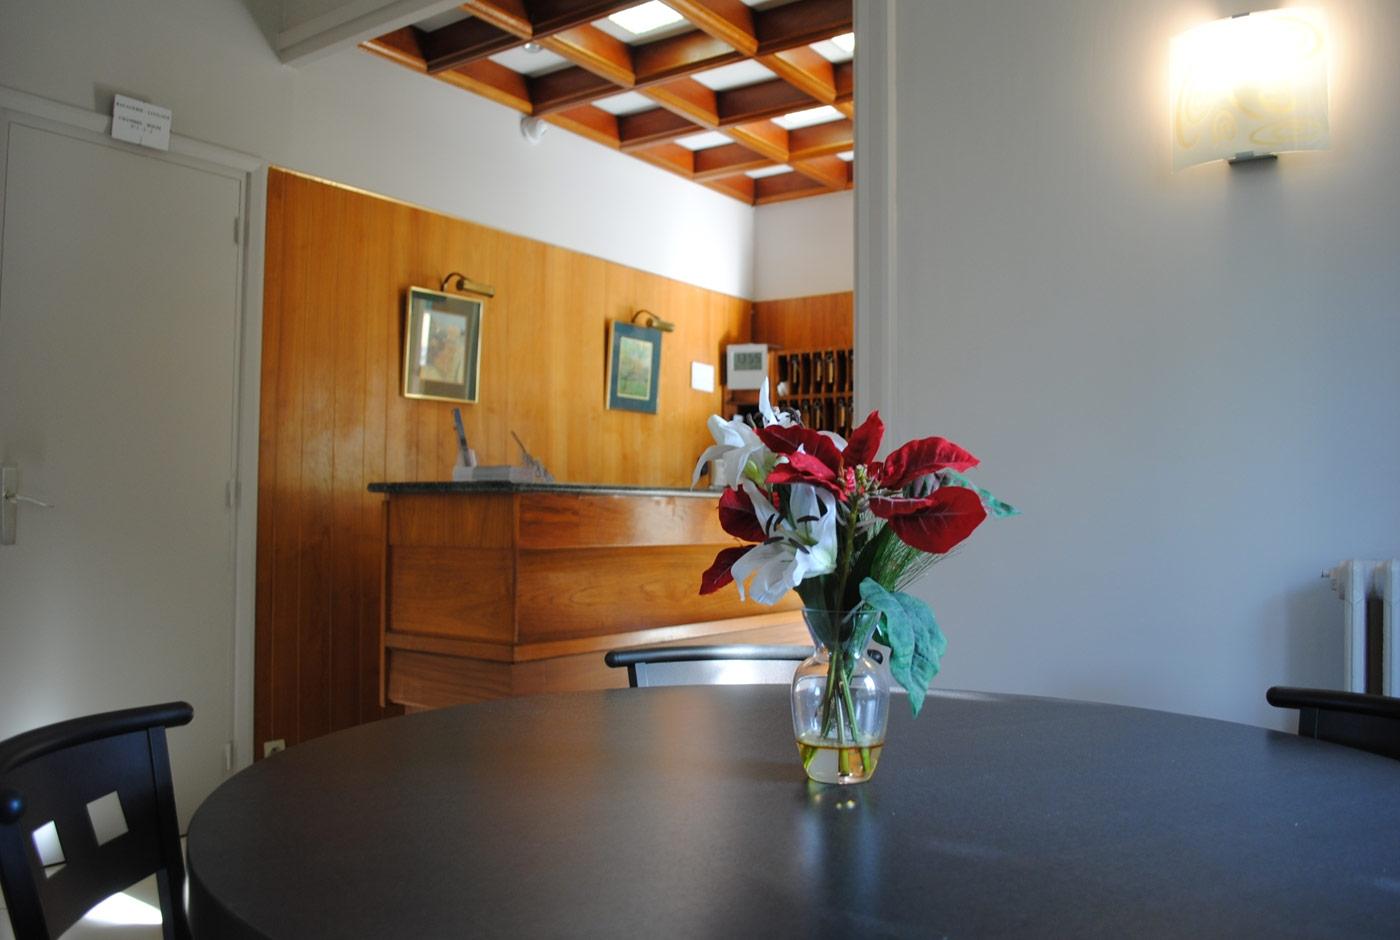 hotel-lacassagne-home-slide06